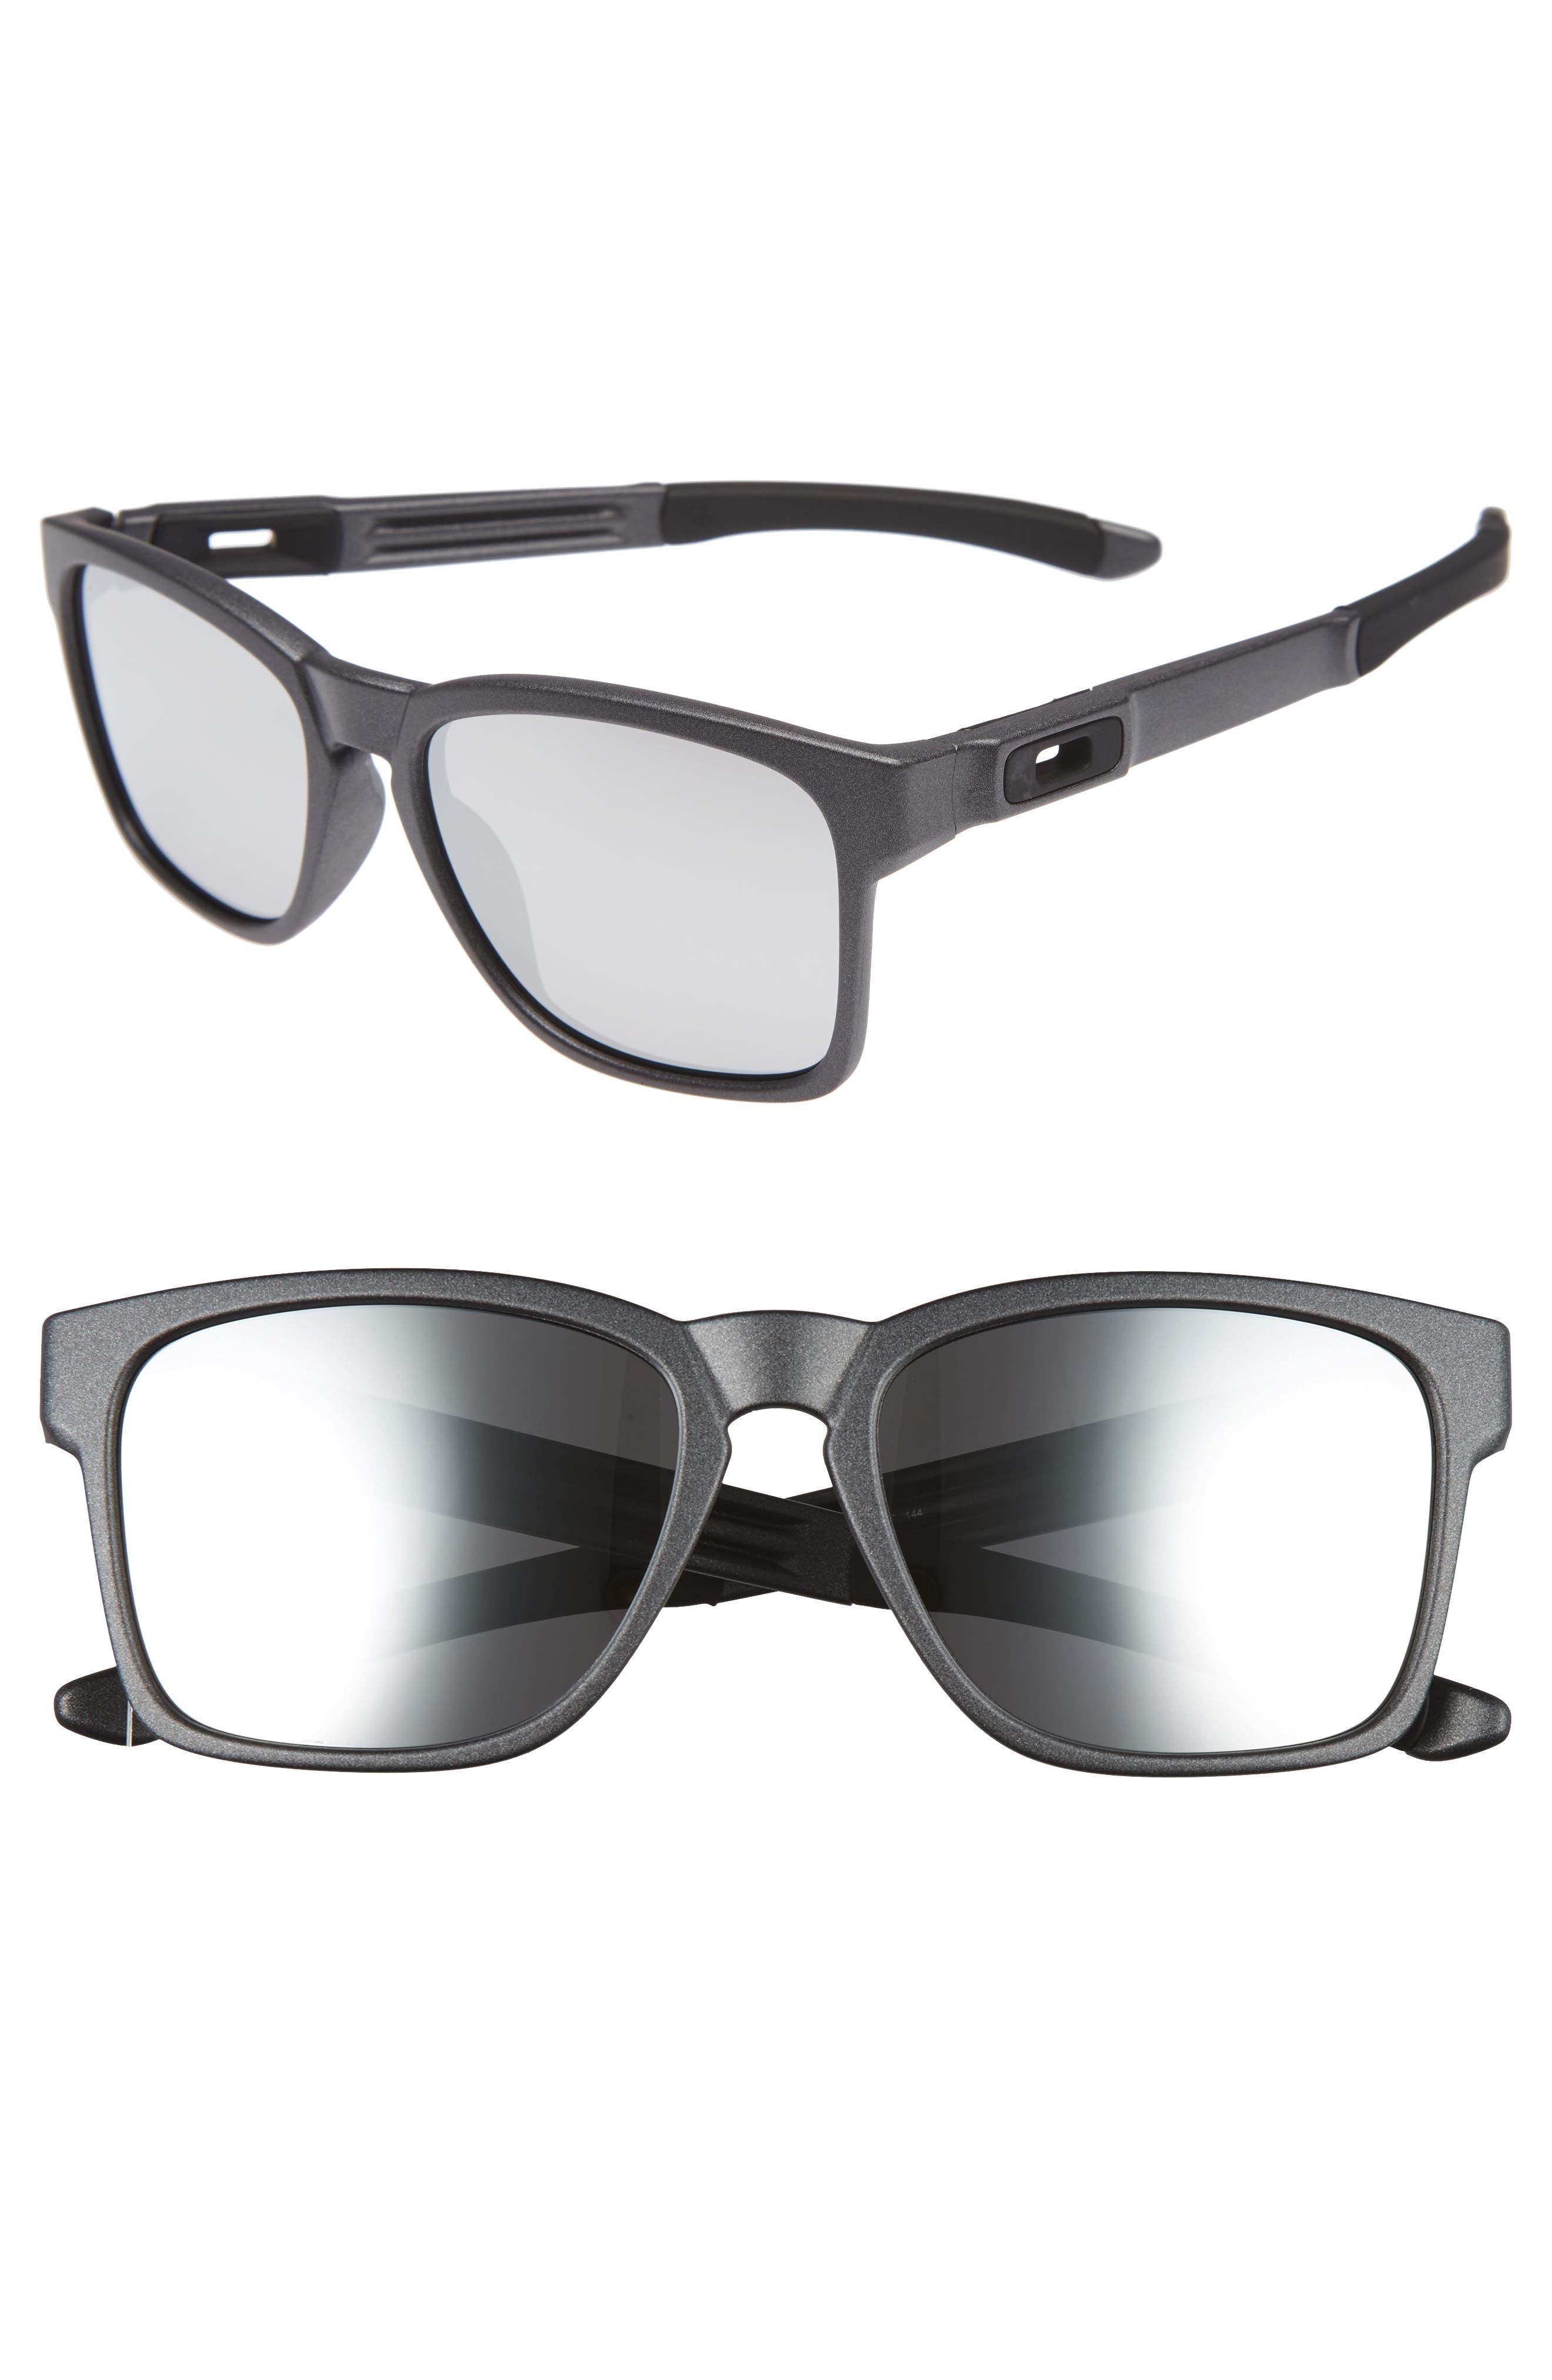 52aabe768ff79 Men s Sunglasses - Oakley